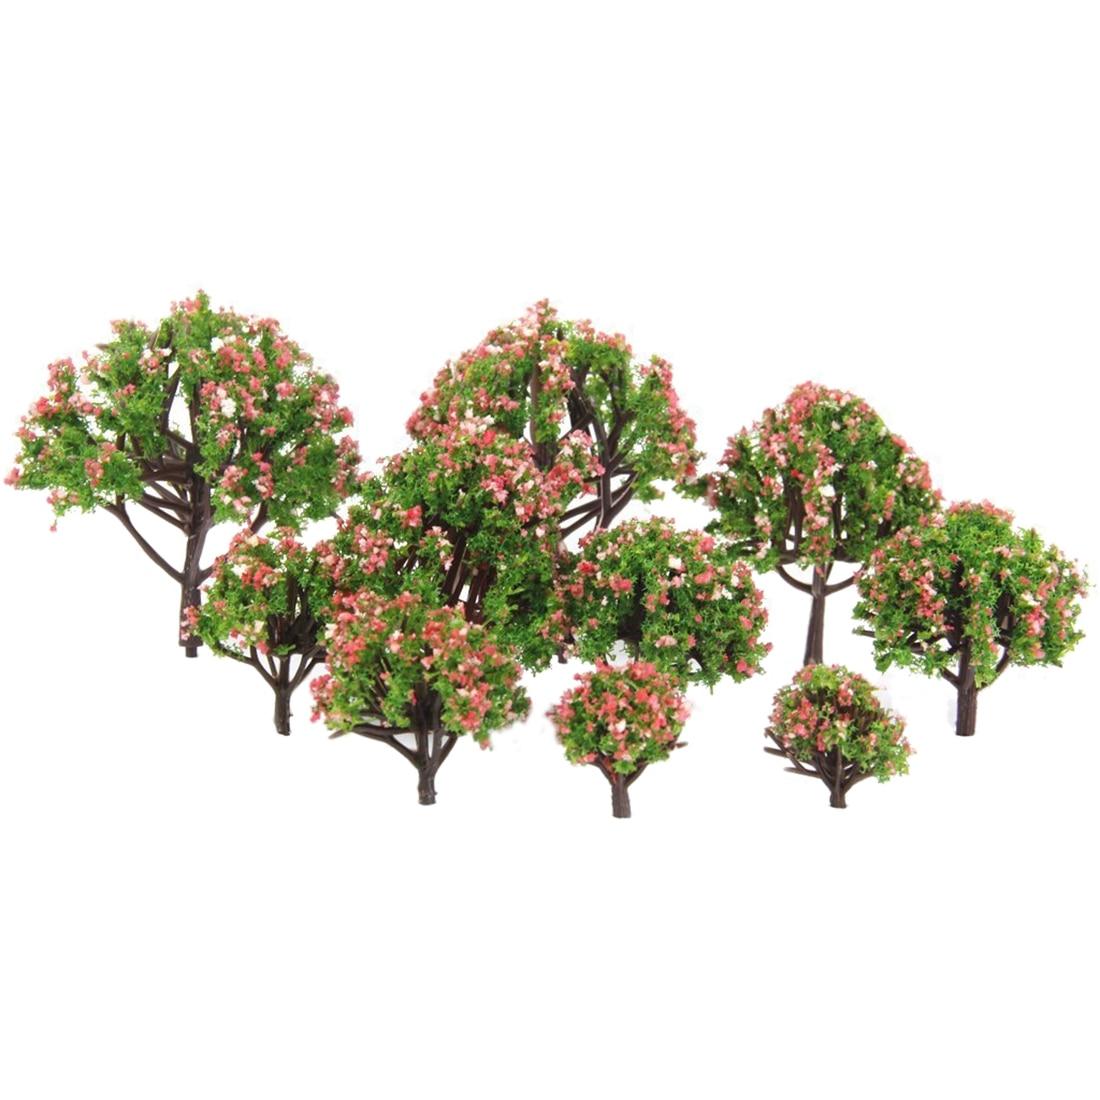 Plastic peach trees model railway railway landscape scale 1:75 - 1: 500